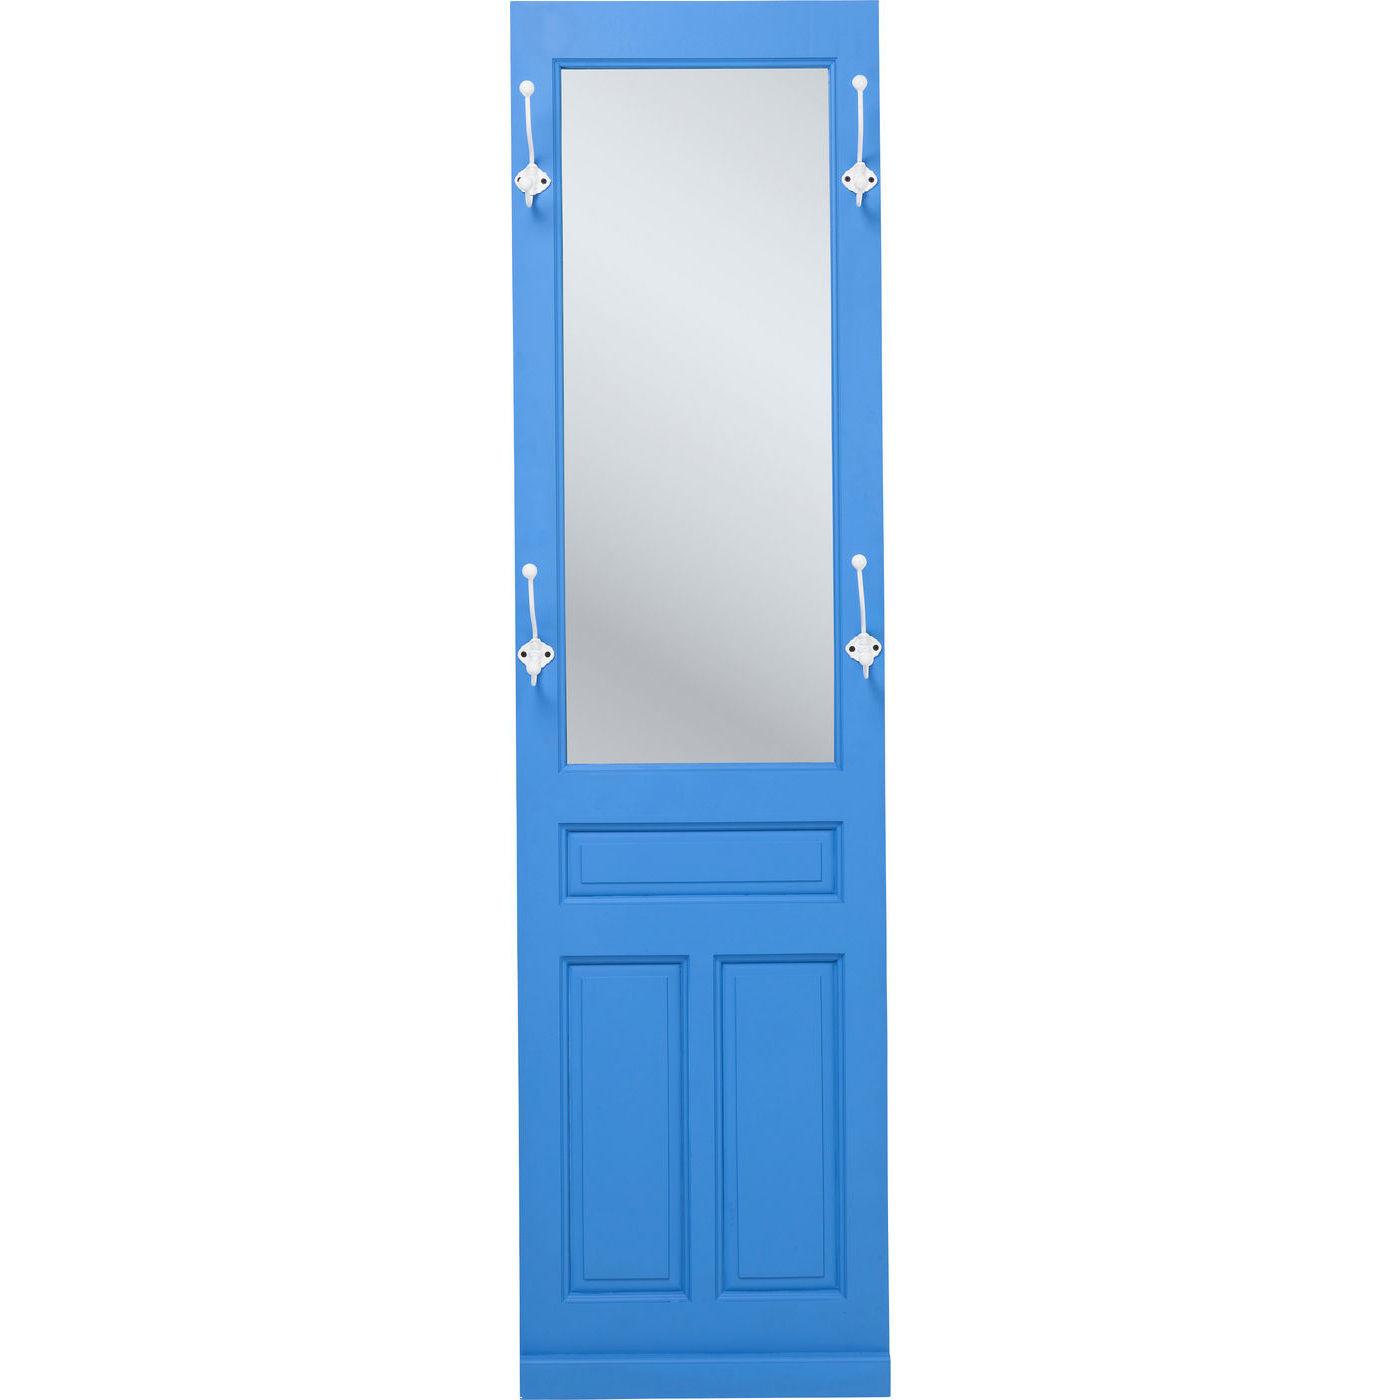 garderobe santorini mirror kare design mutoni m bel. Black Bedroom Furniture Sets. Home Design Ideas